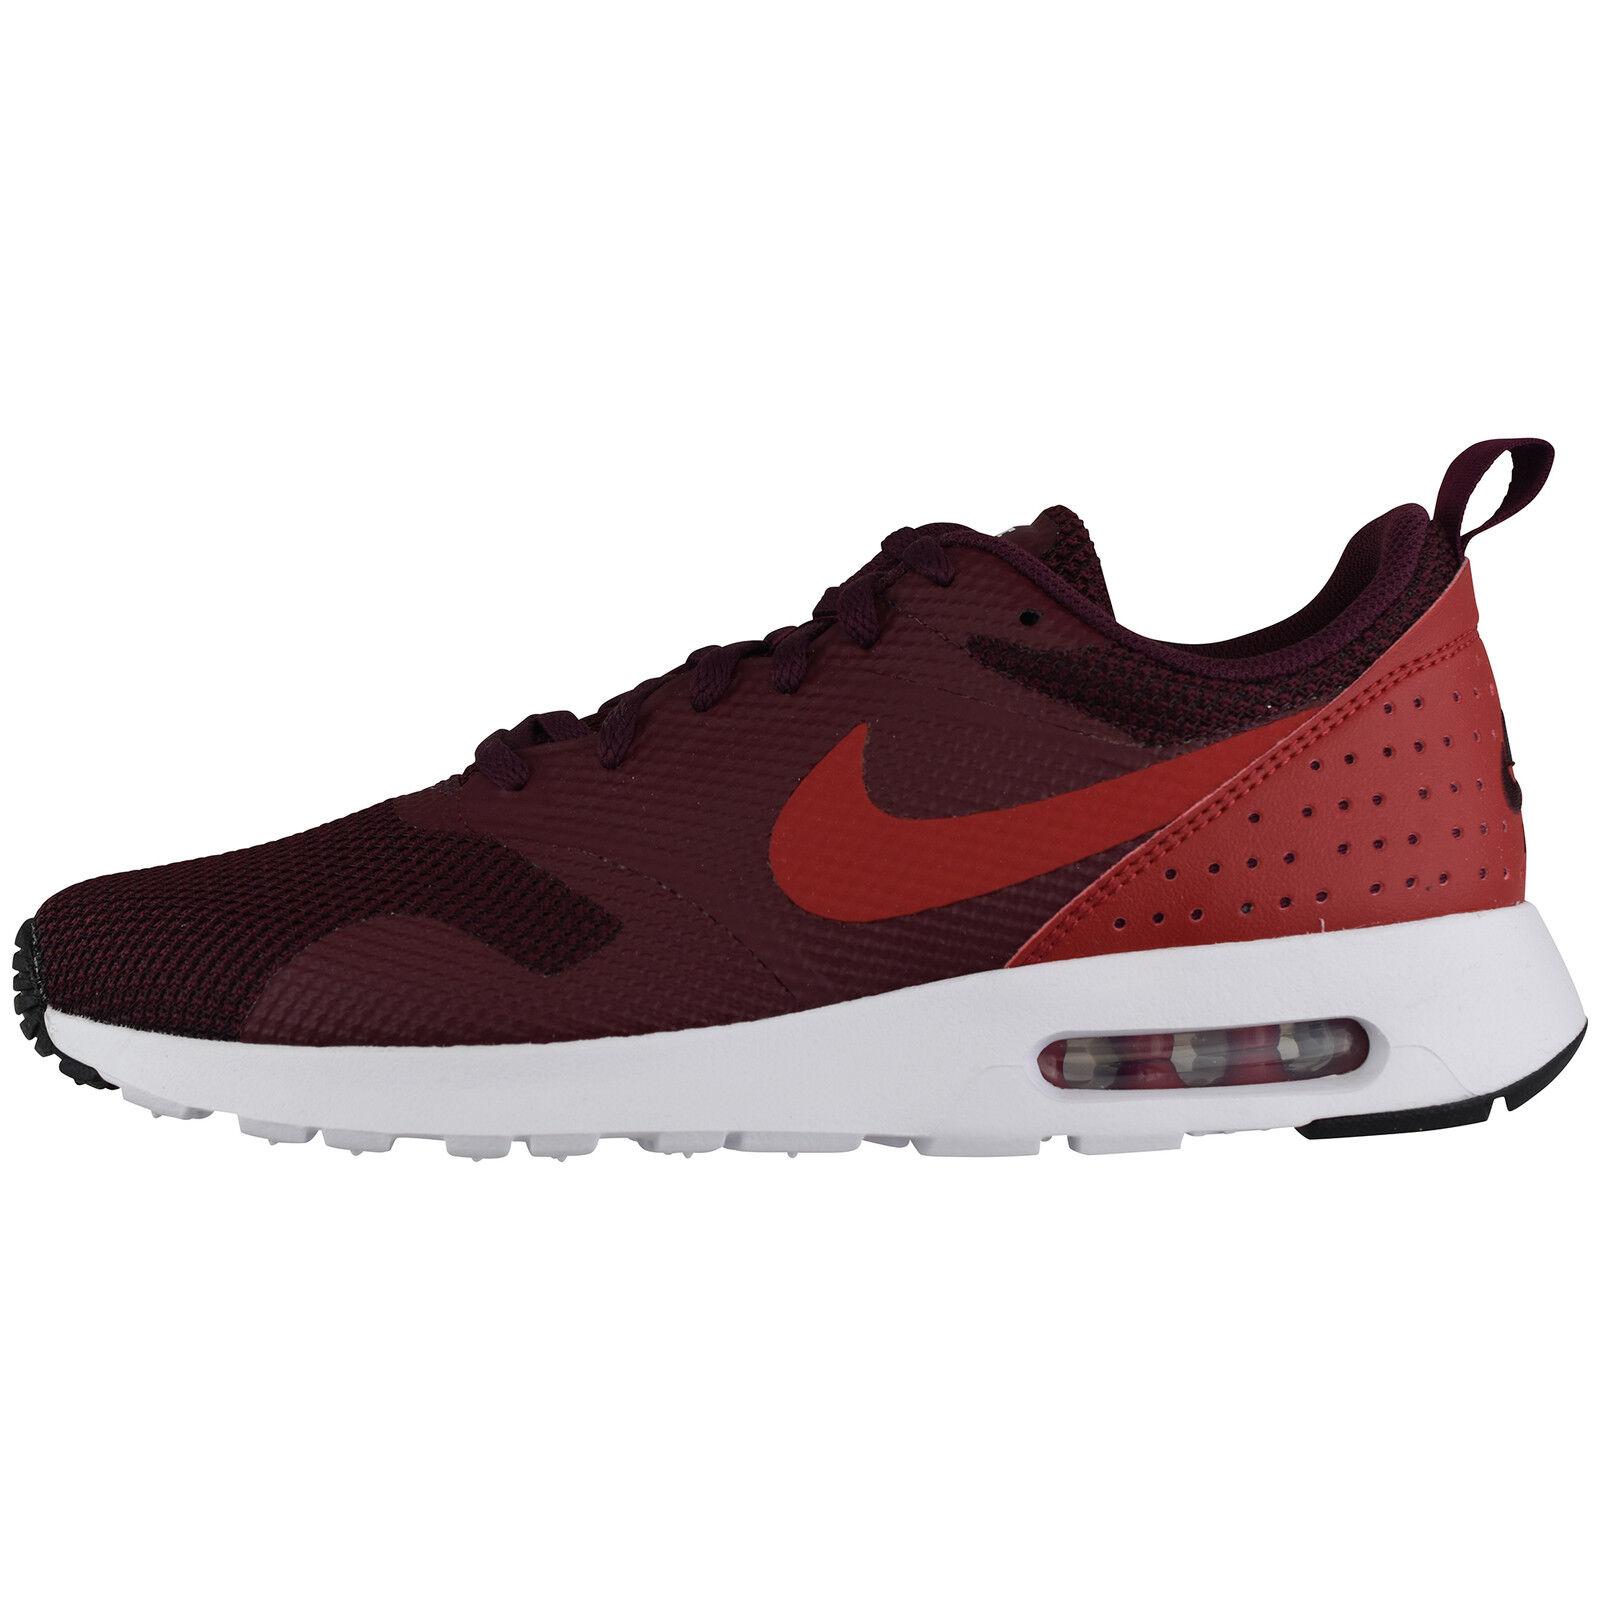 Nike Air Max Tavas Shoe 705149-604 Classic Lifestyle Freizeit Schuh Sneaker